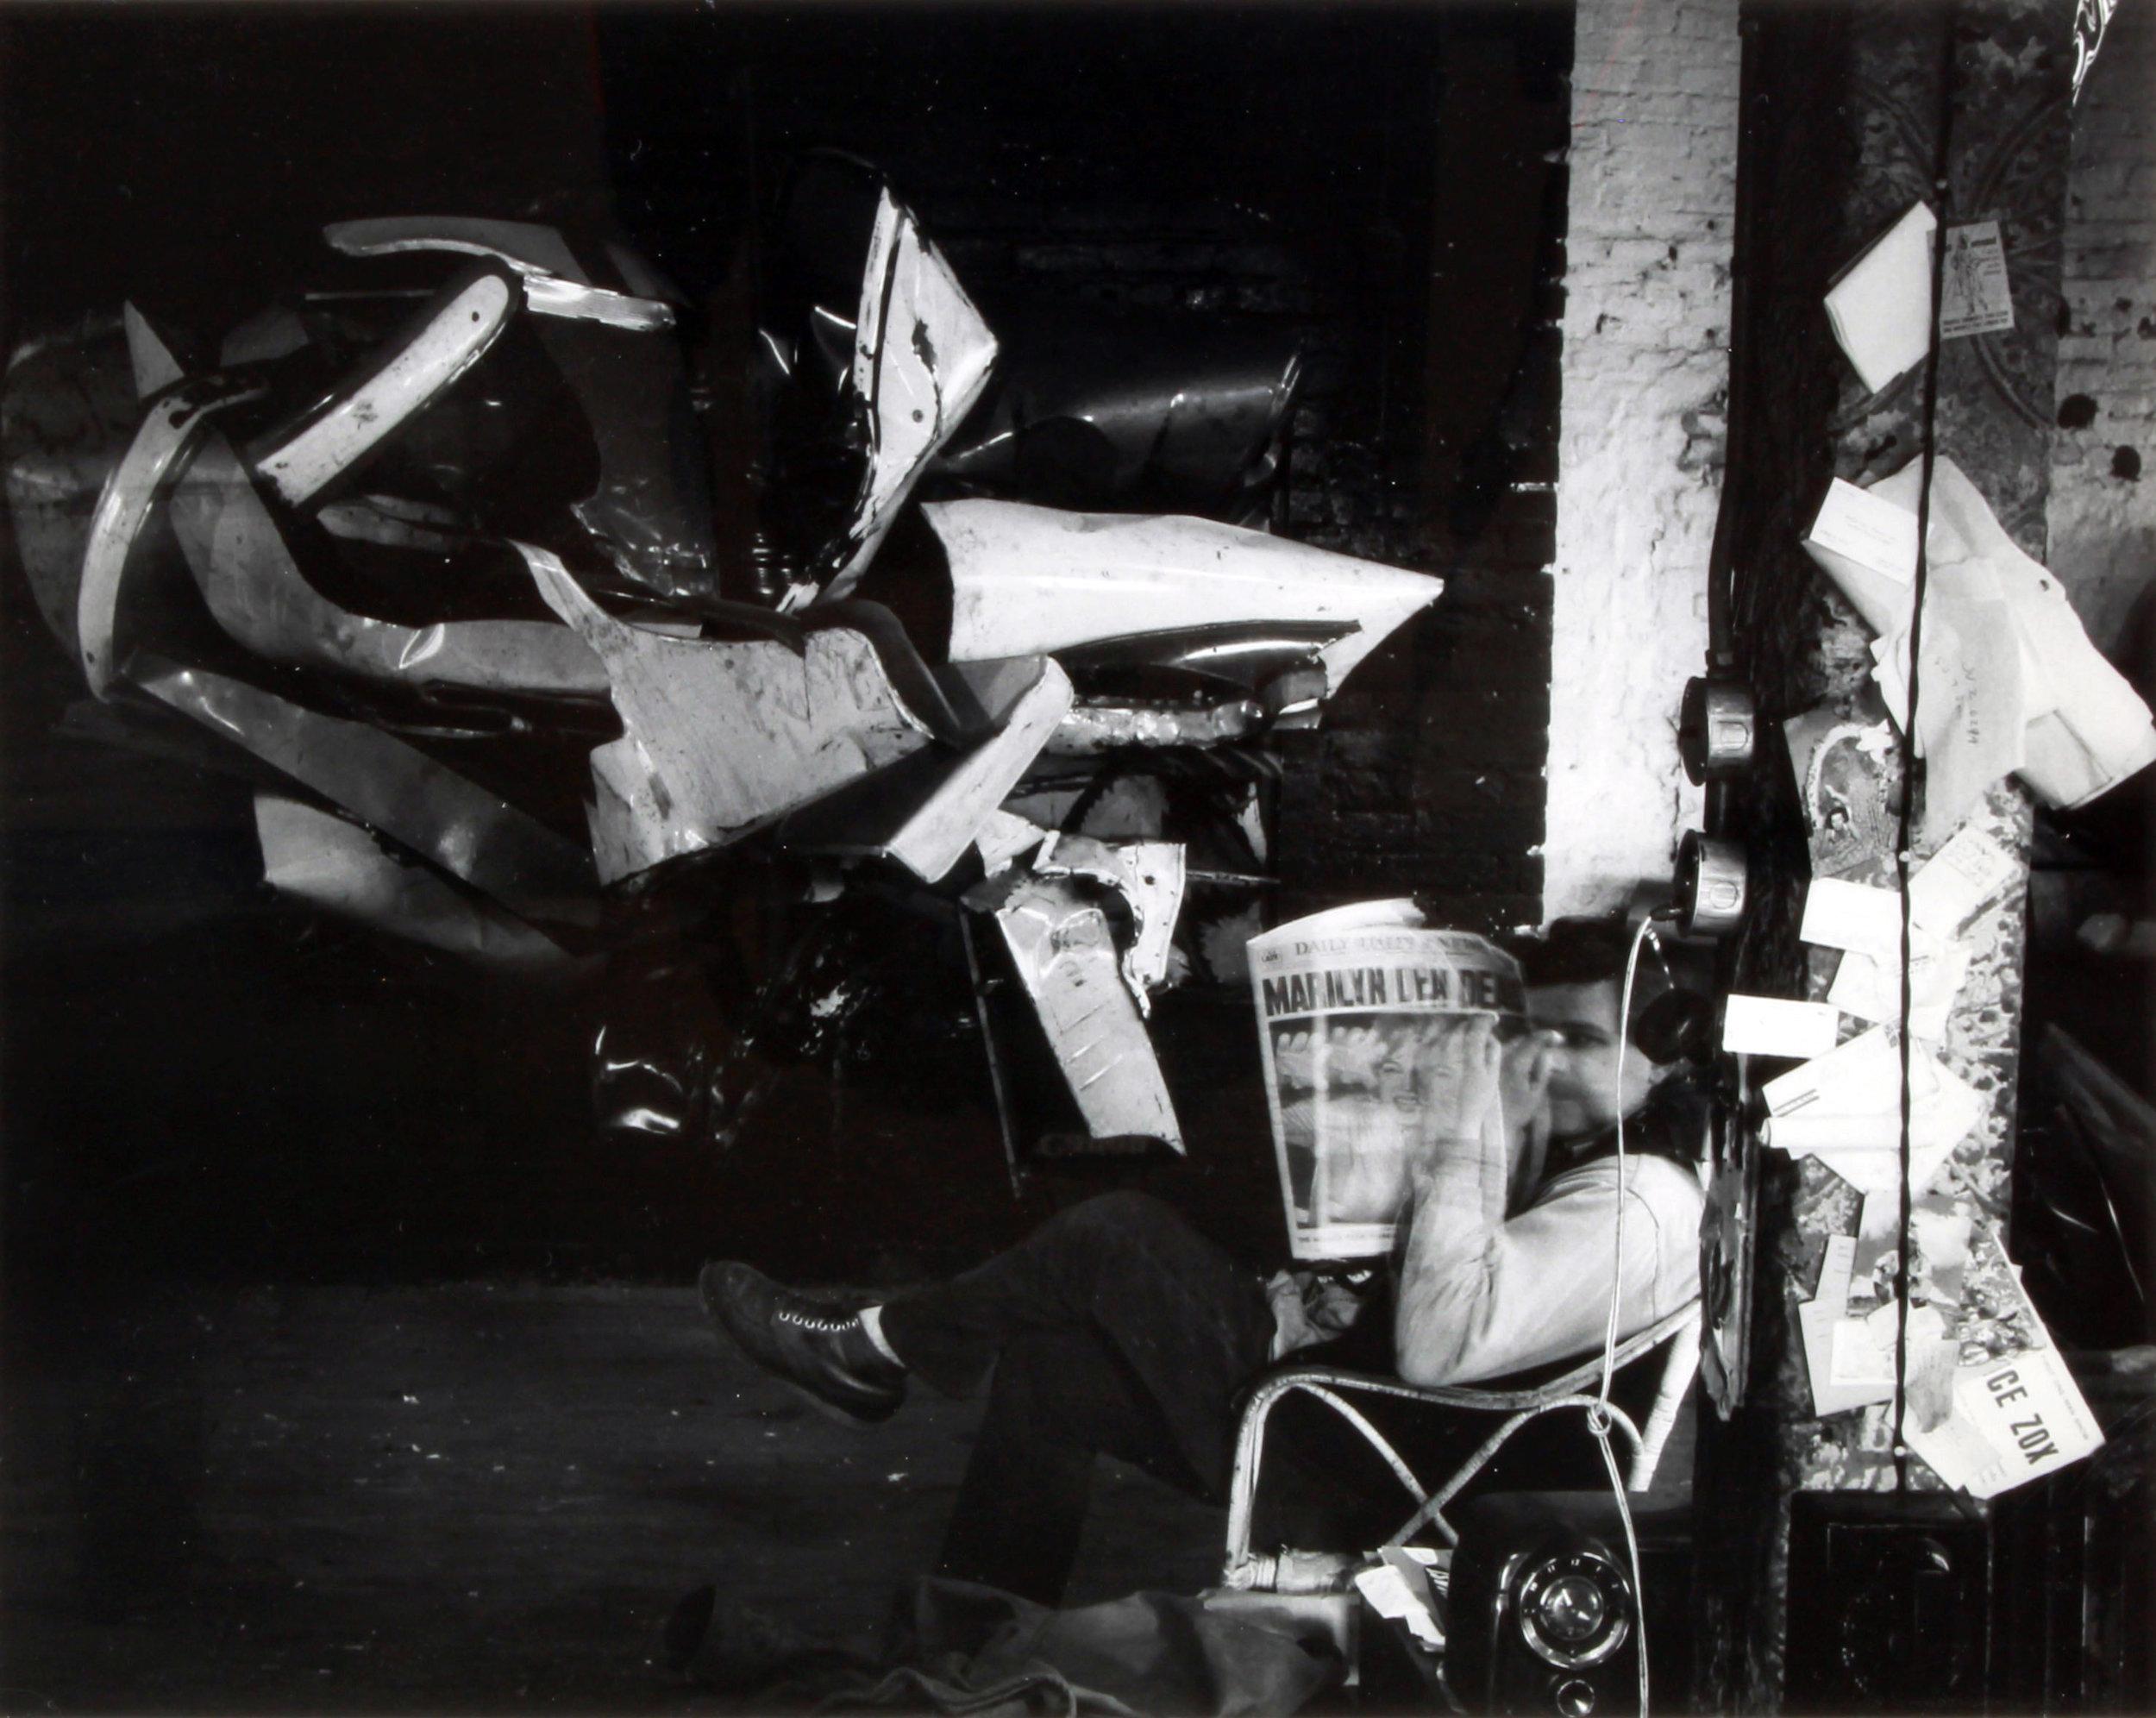 Hollis Frampton | John Chamberlain (1963)